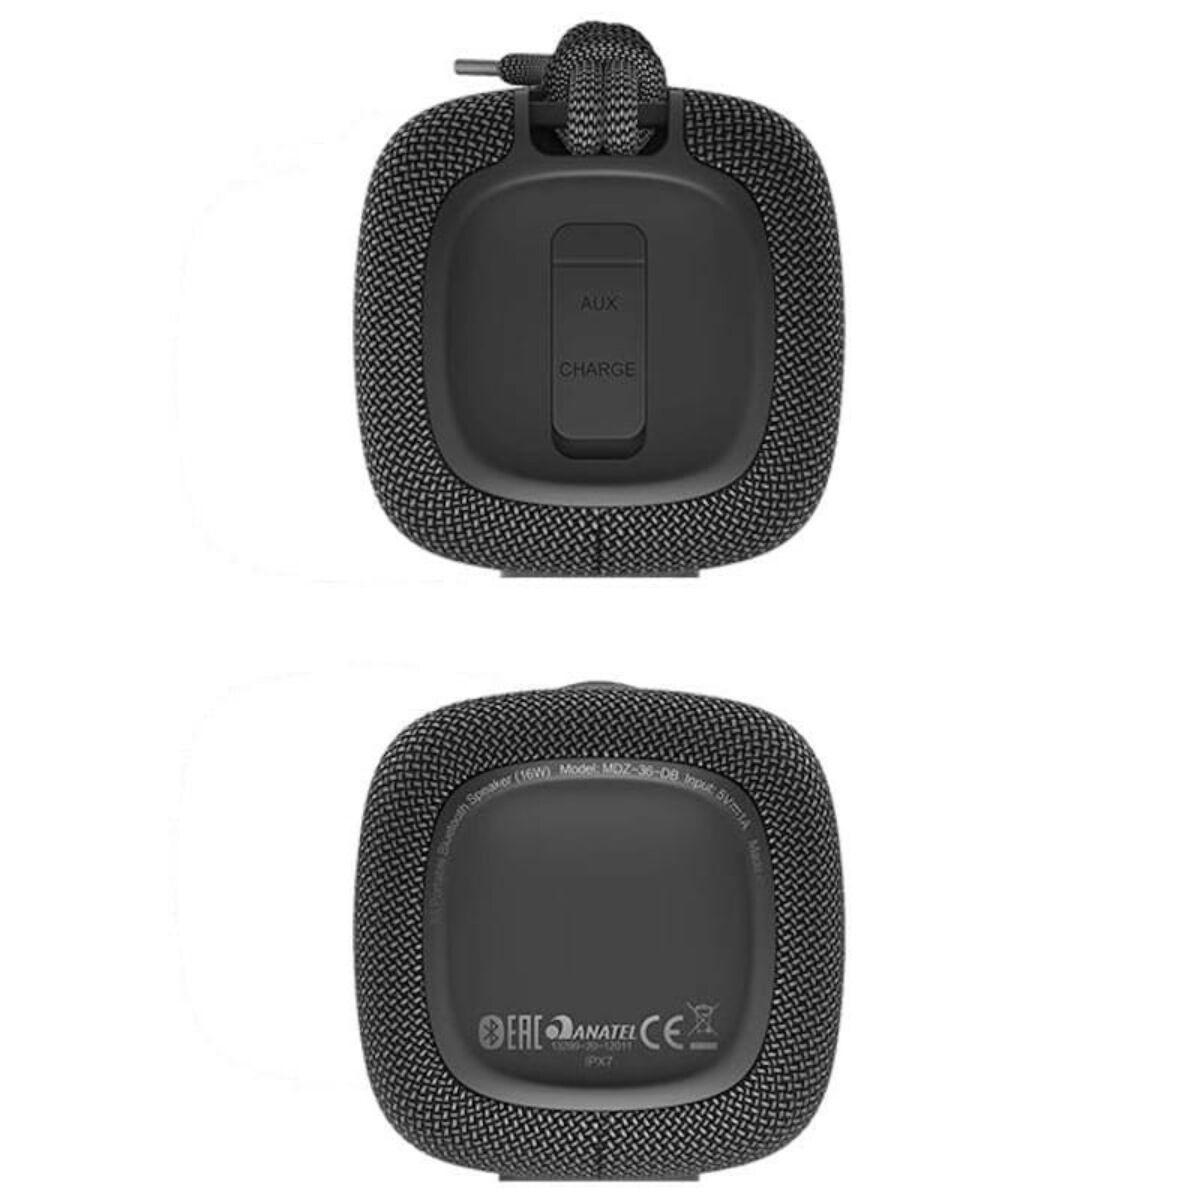 Xiaomi Mi Portable Bluetooth Outdoor Speaker hordozható hangszóró, fekete  EU